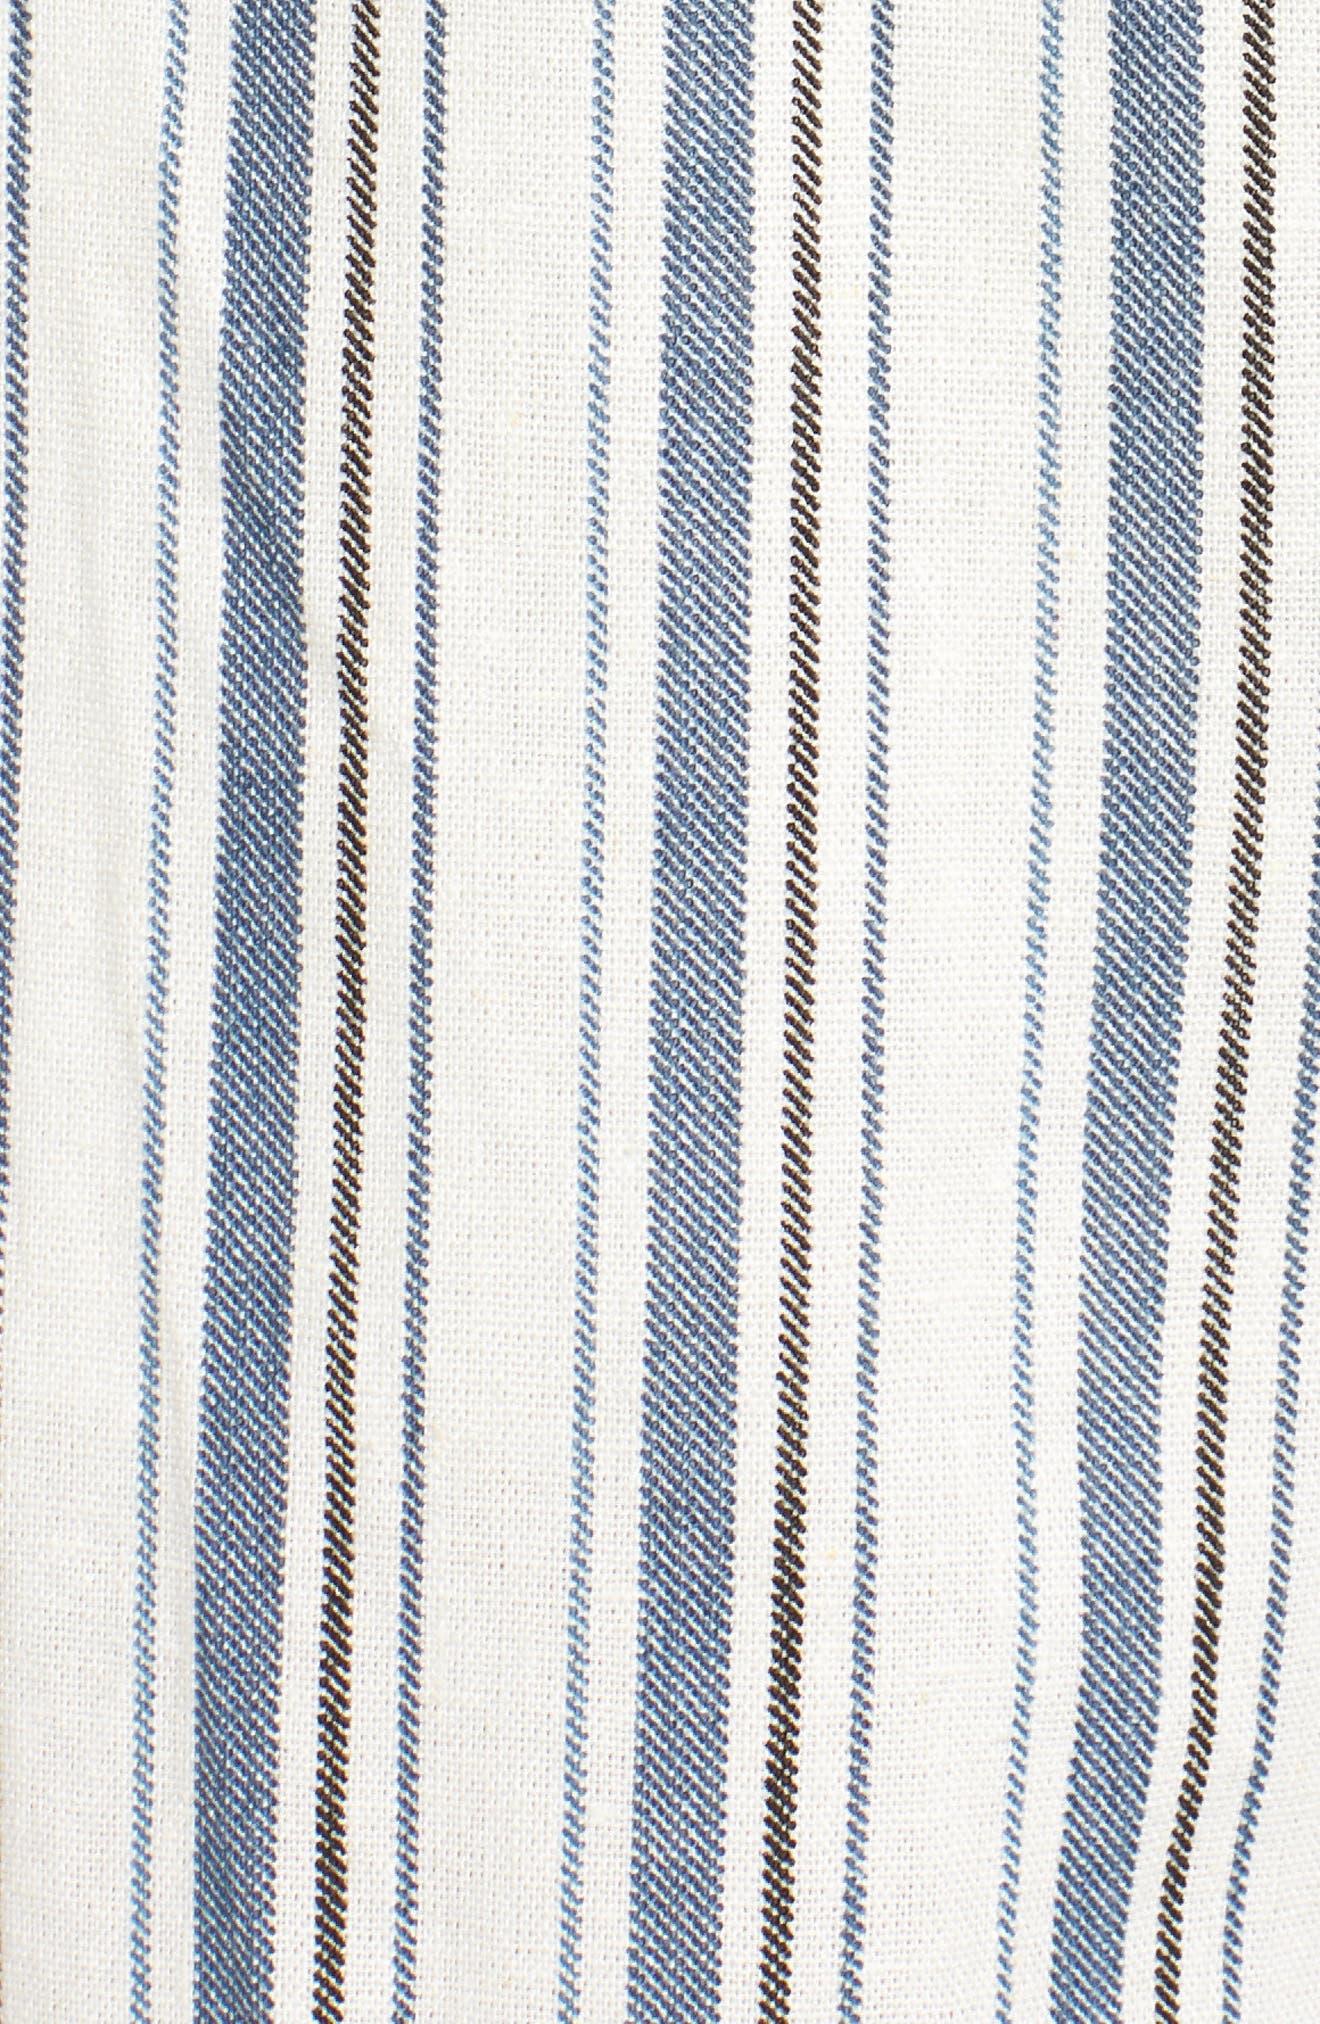 Strapless Crop Jumpsuit,                             Alternate thumbnail 6, color,                             005 Taupe/ Blue